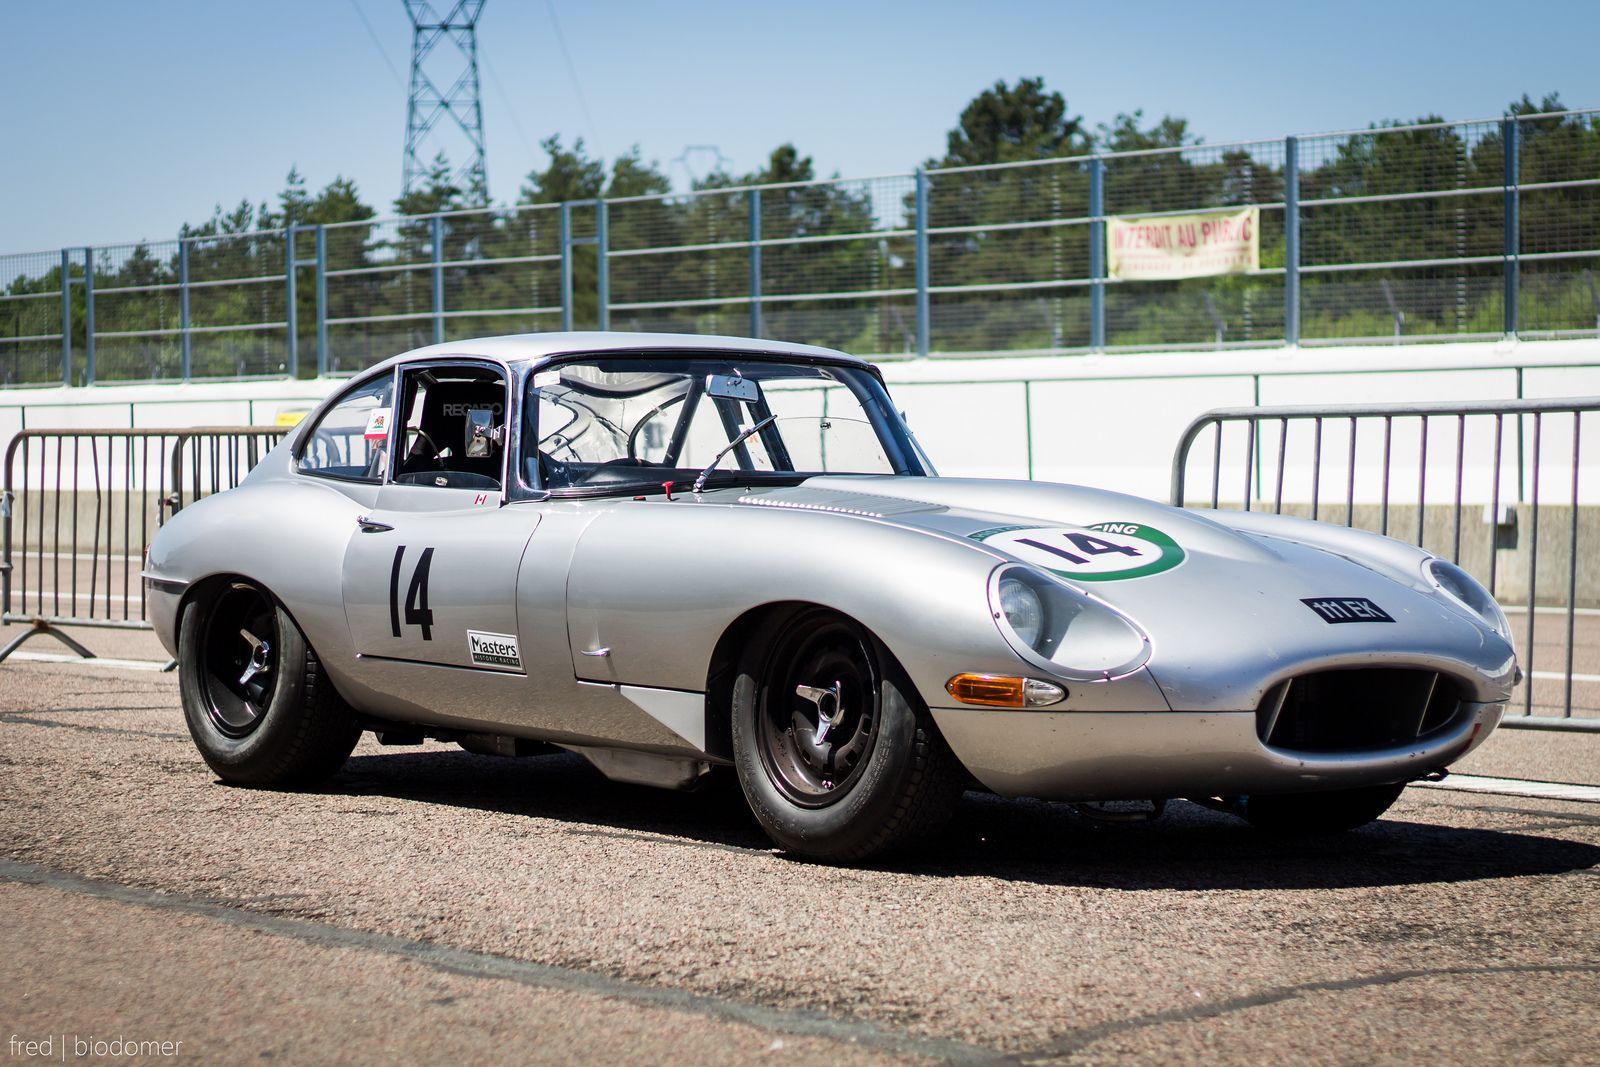 Classic Jaguar Type E Race Car